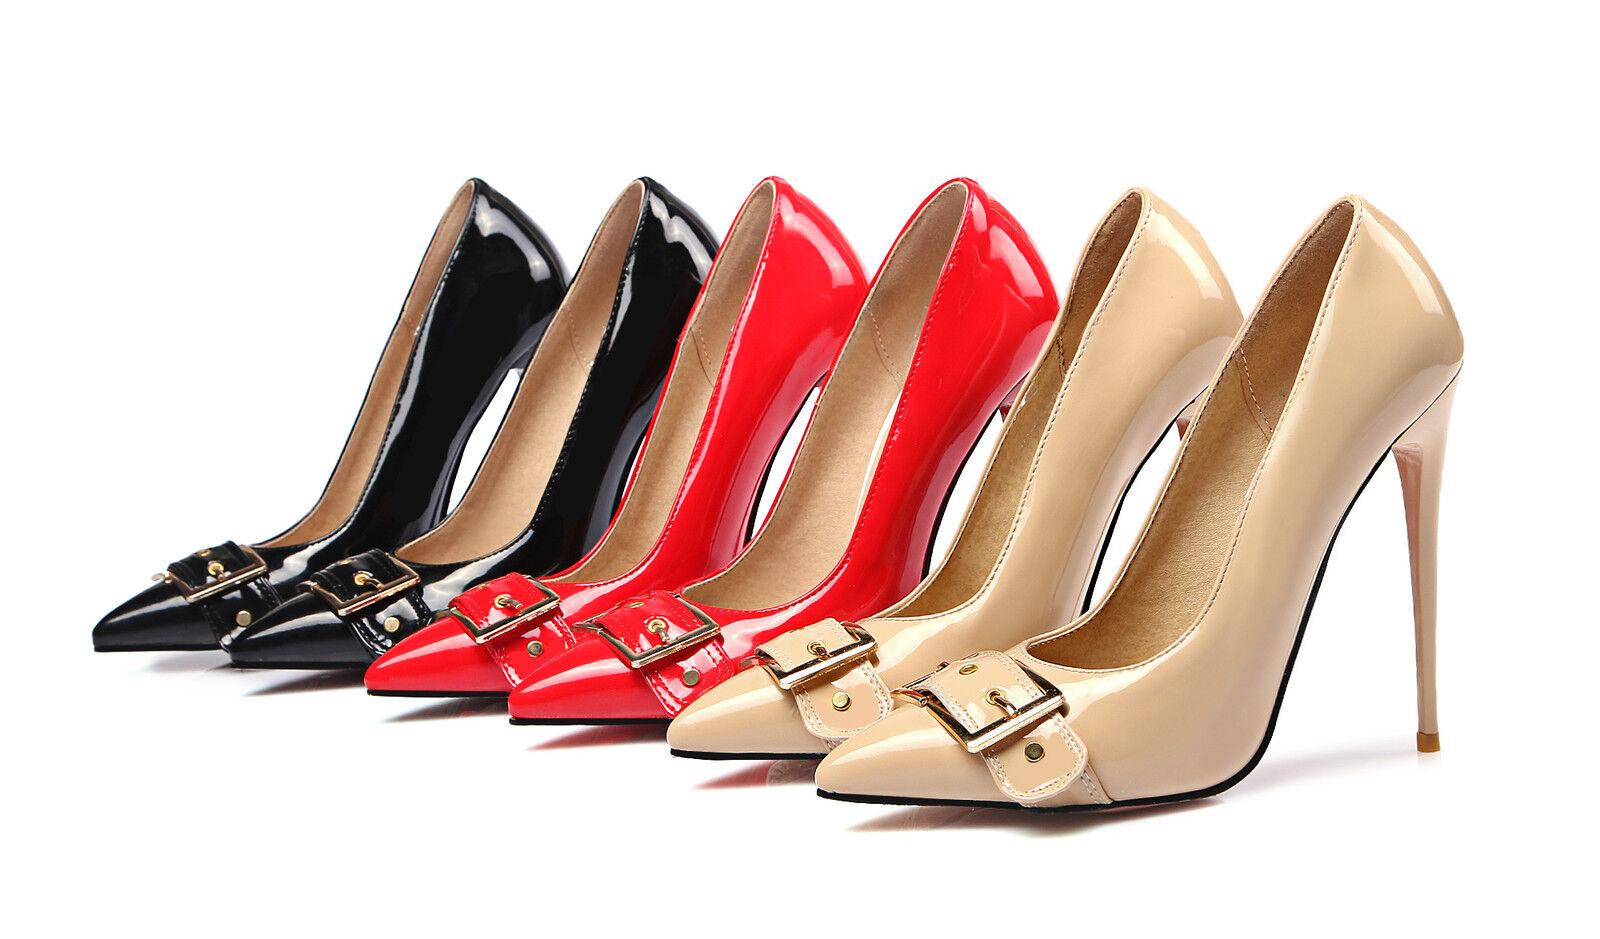 Zapatos de cuero 2018 sintético para para para mujer del partido Zapato Taco Alto Zapatos De Salón nosotros tamaño 4-14  100% garantía genuina de contador